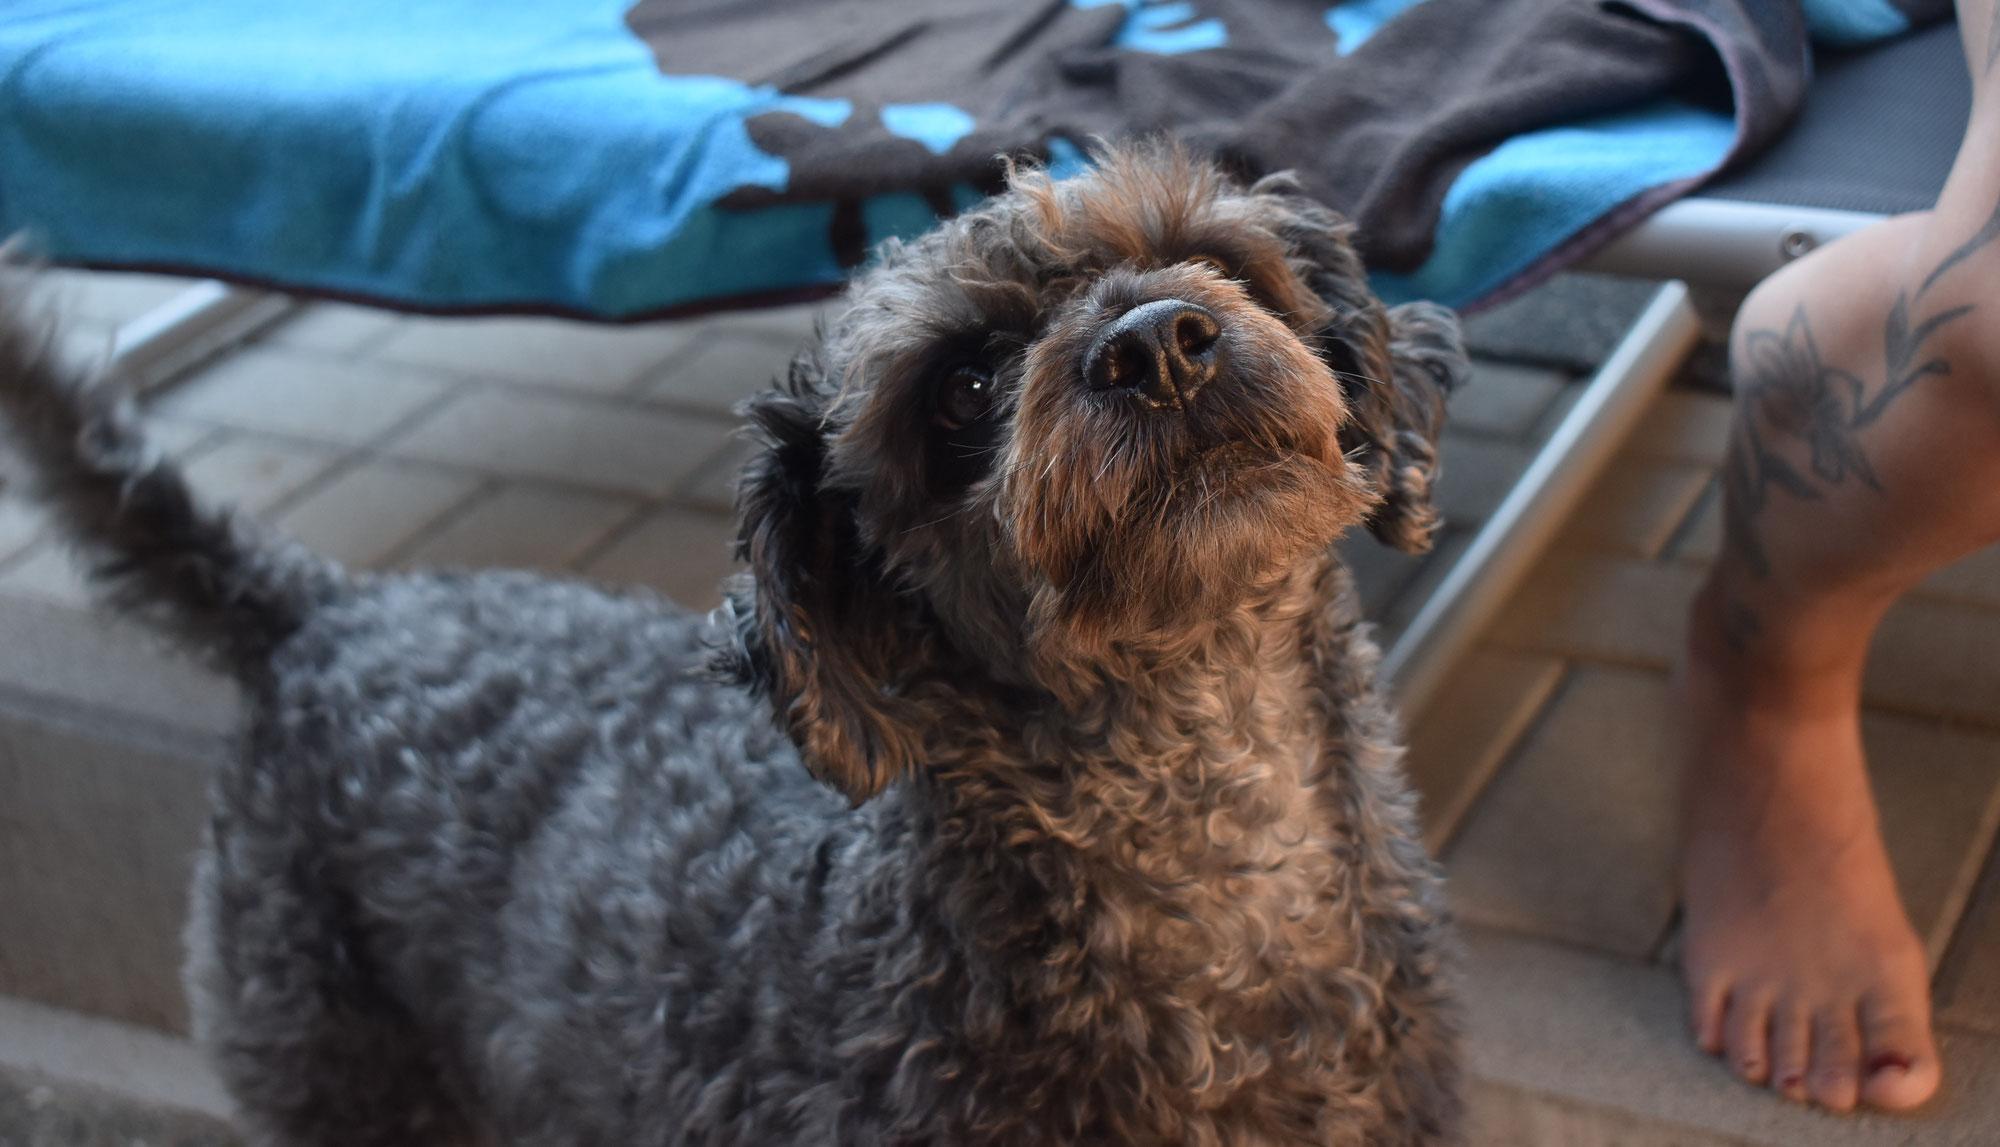 Hundesteuererhöhung durchgewunken, Bedenken im Rat